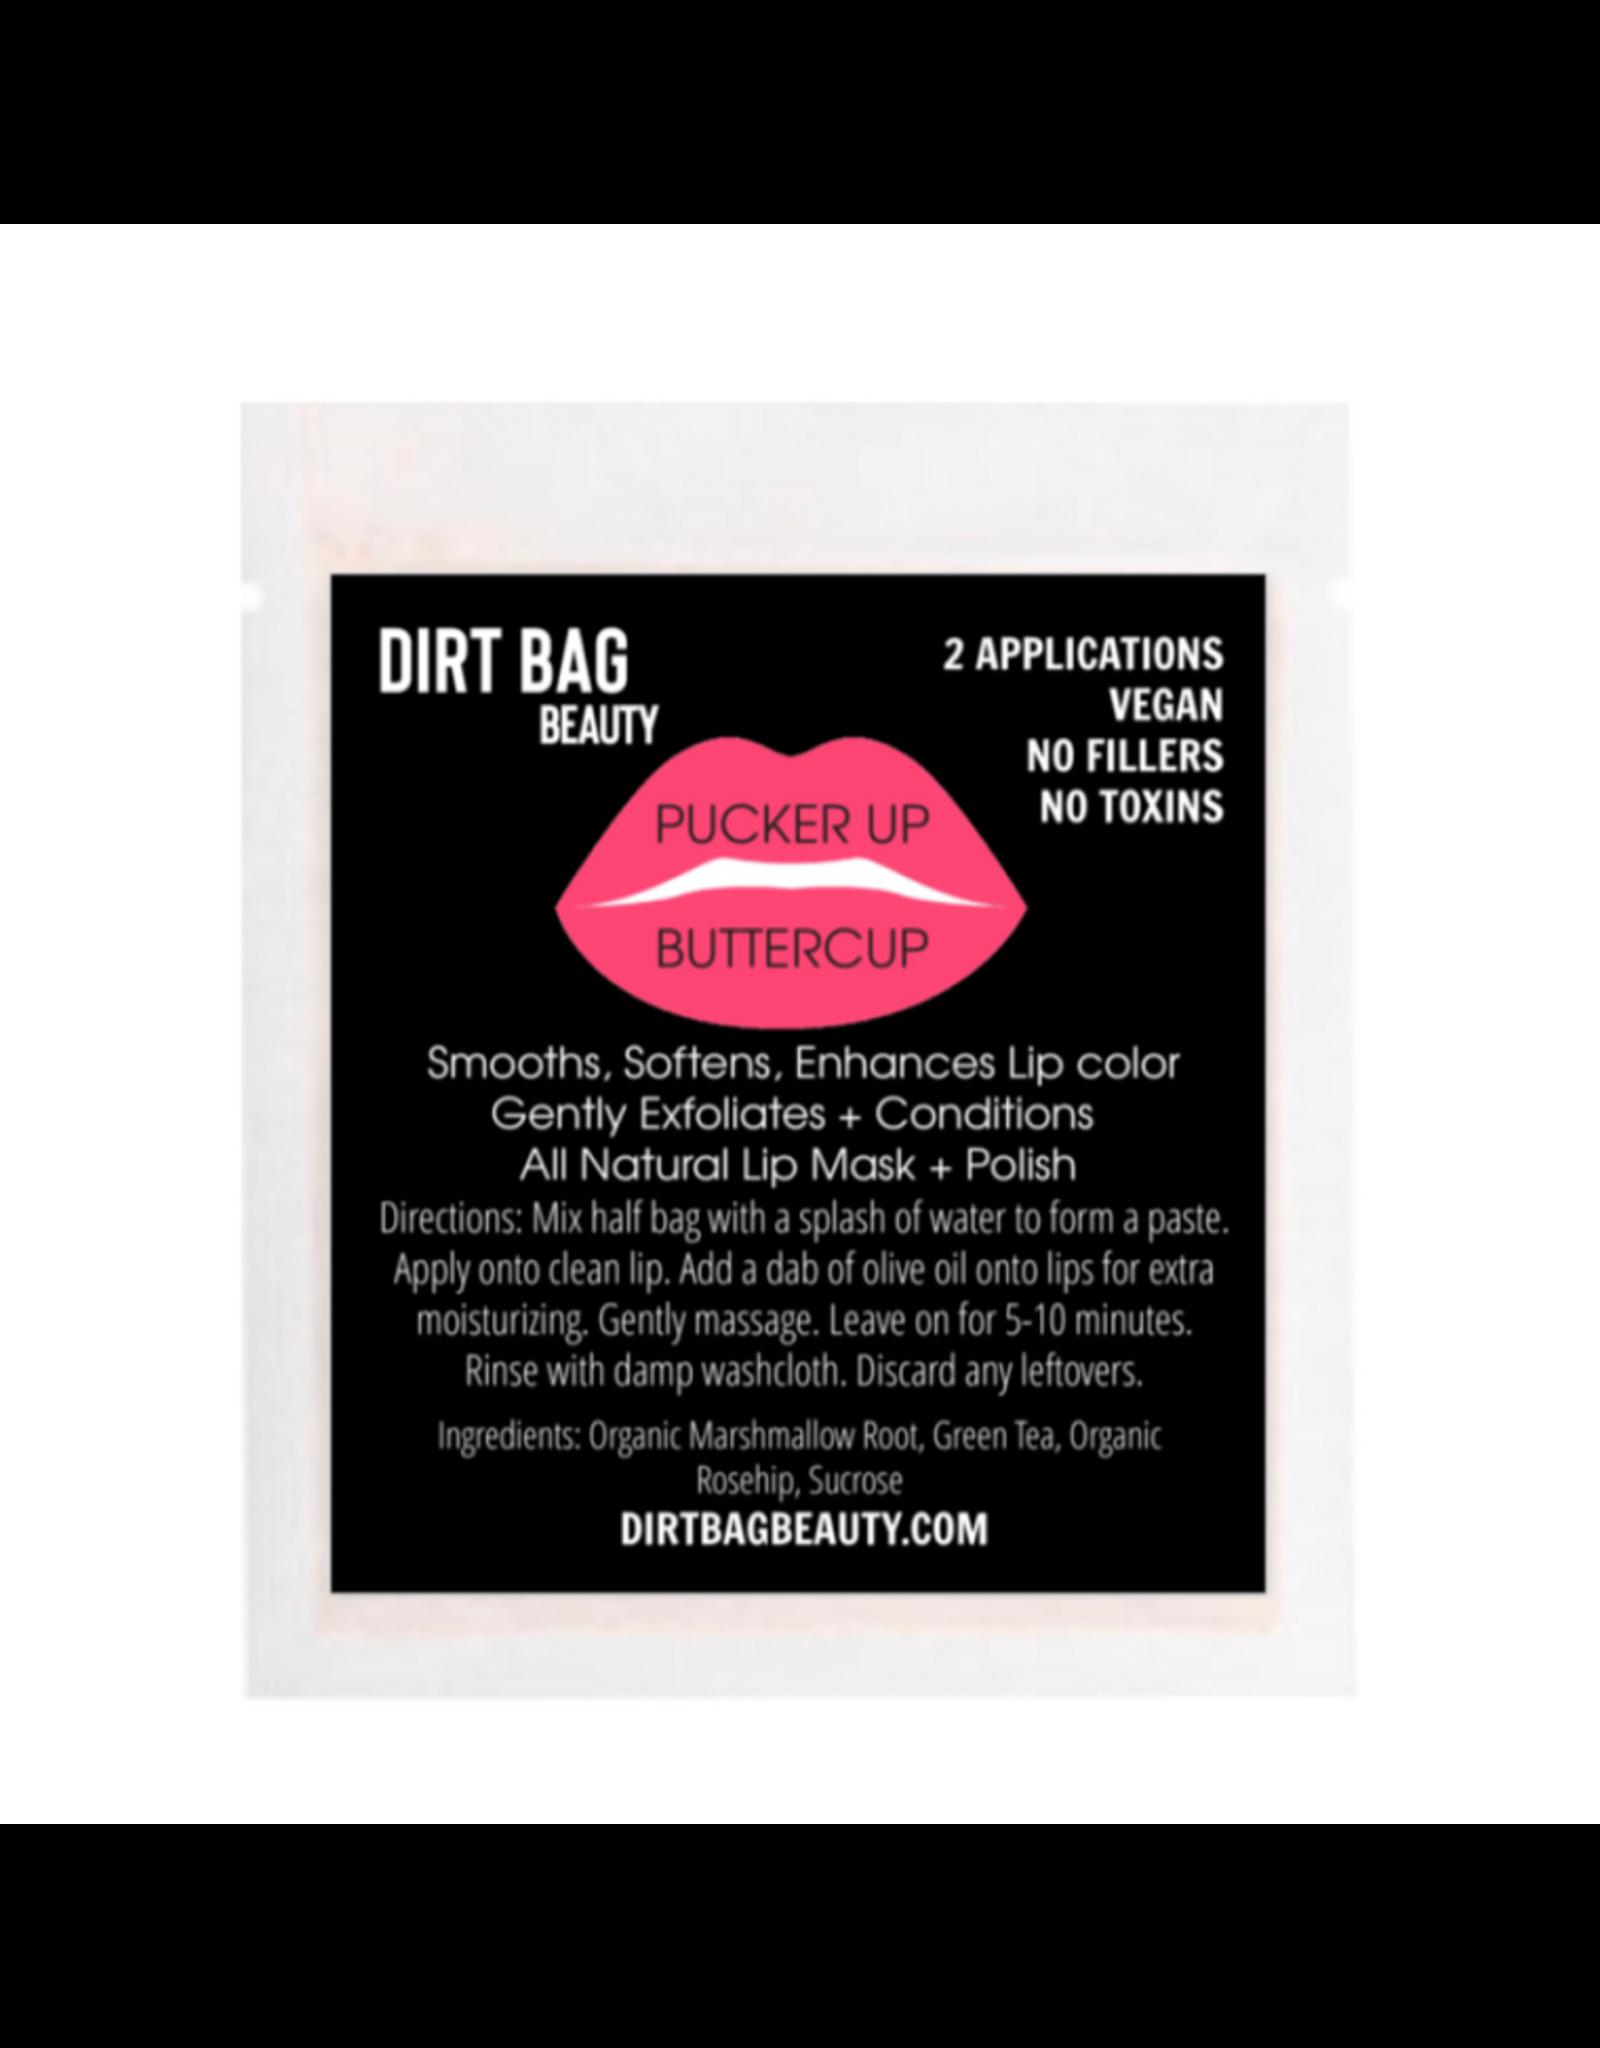 All Natural Vegan Lip Mask + Polish- Pucker Up Buttercup